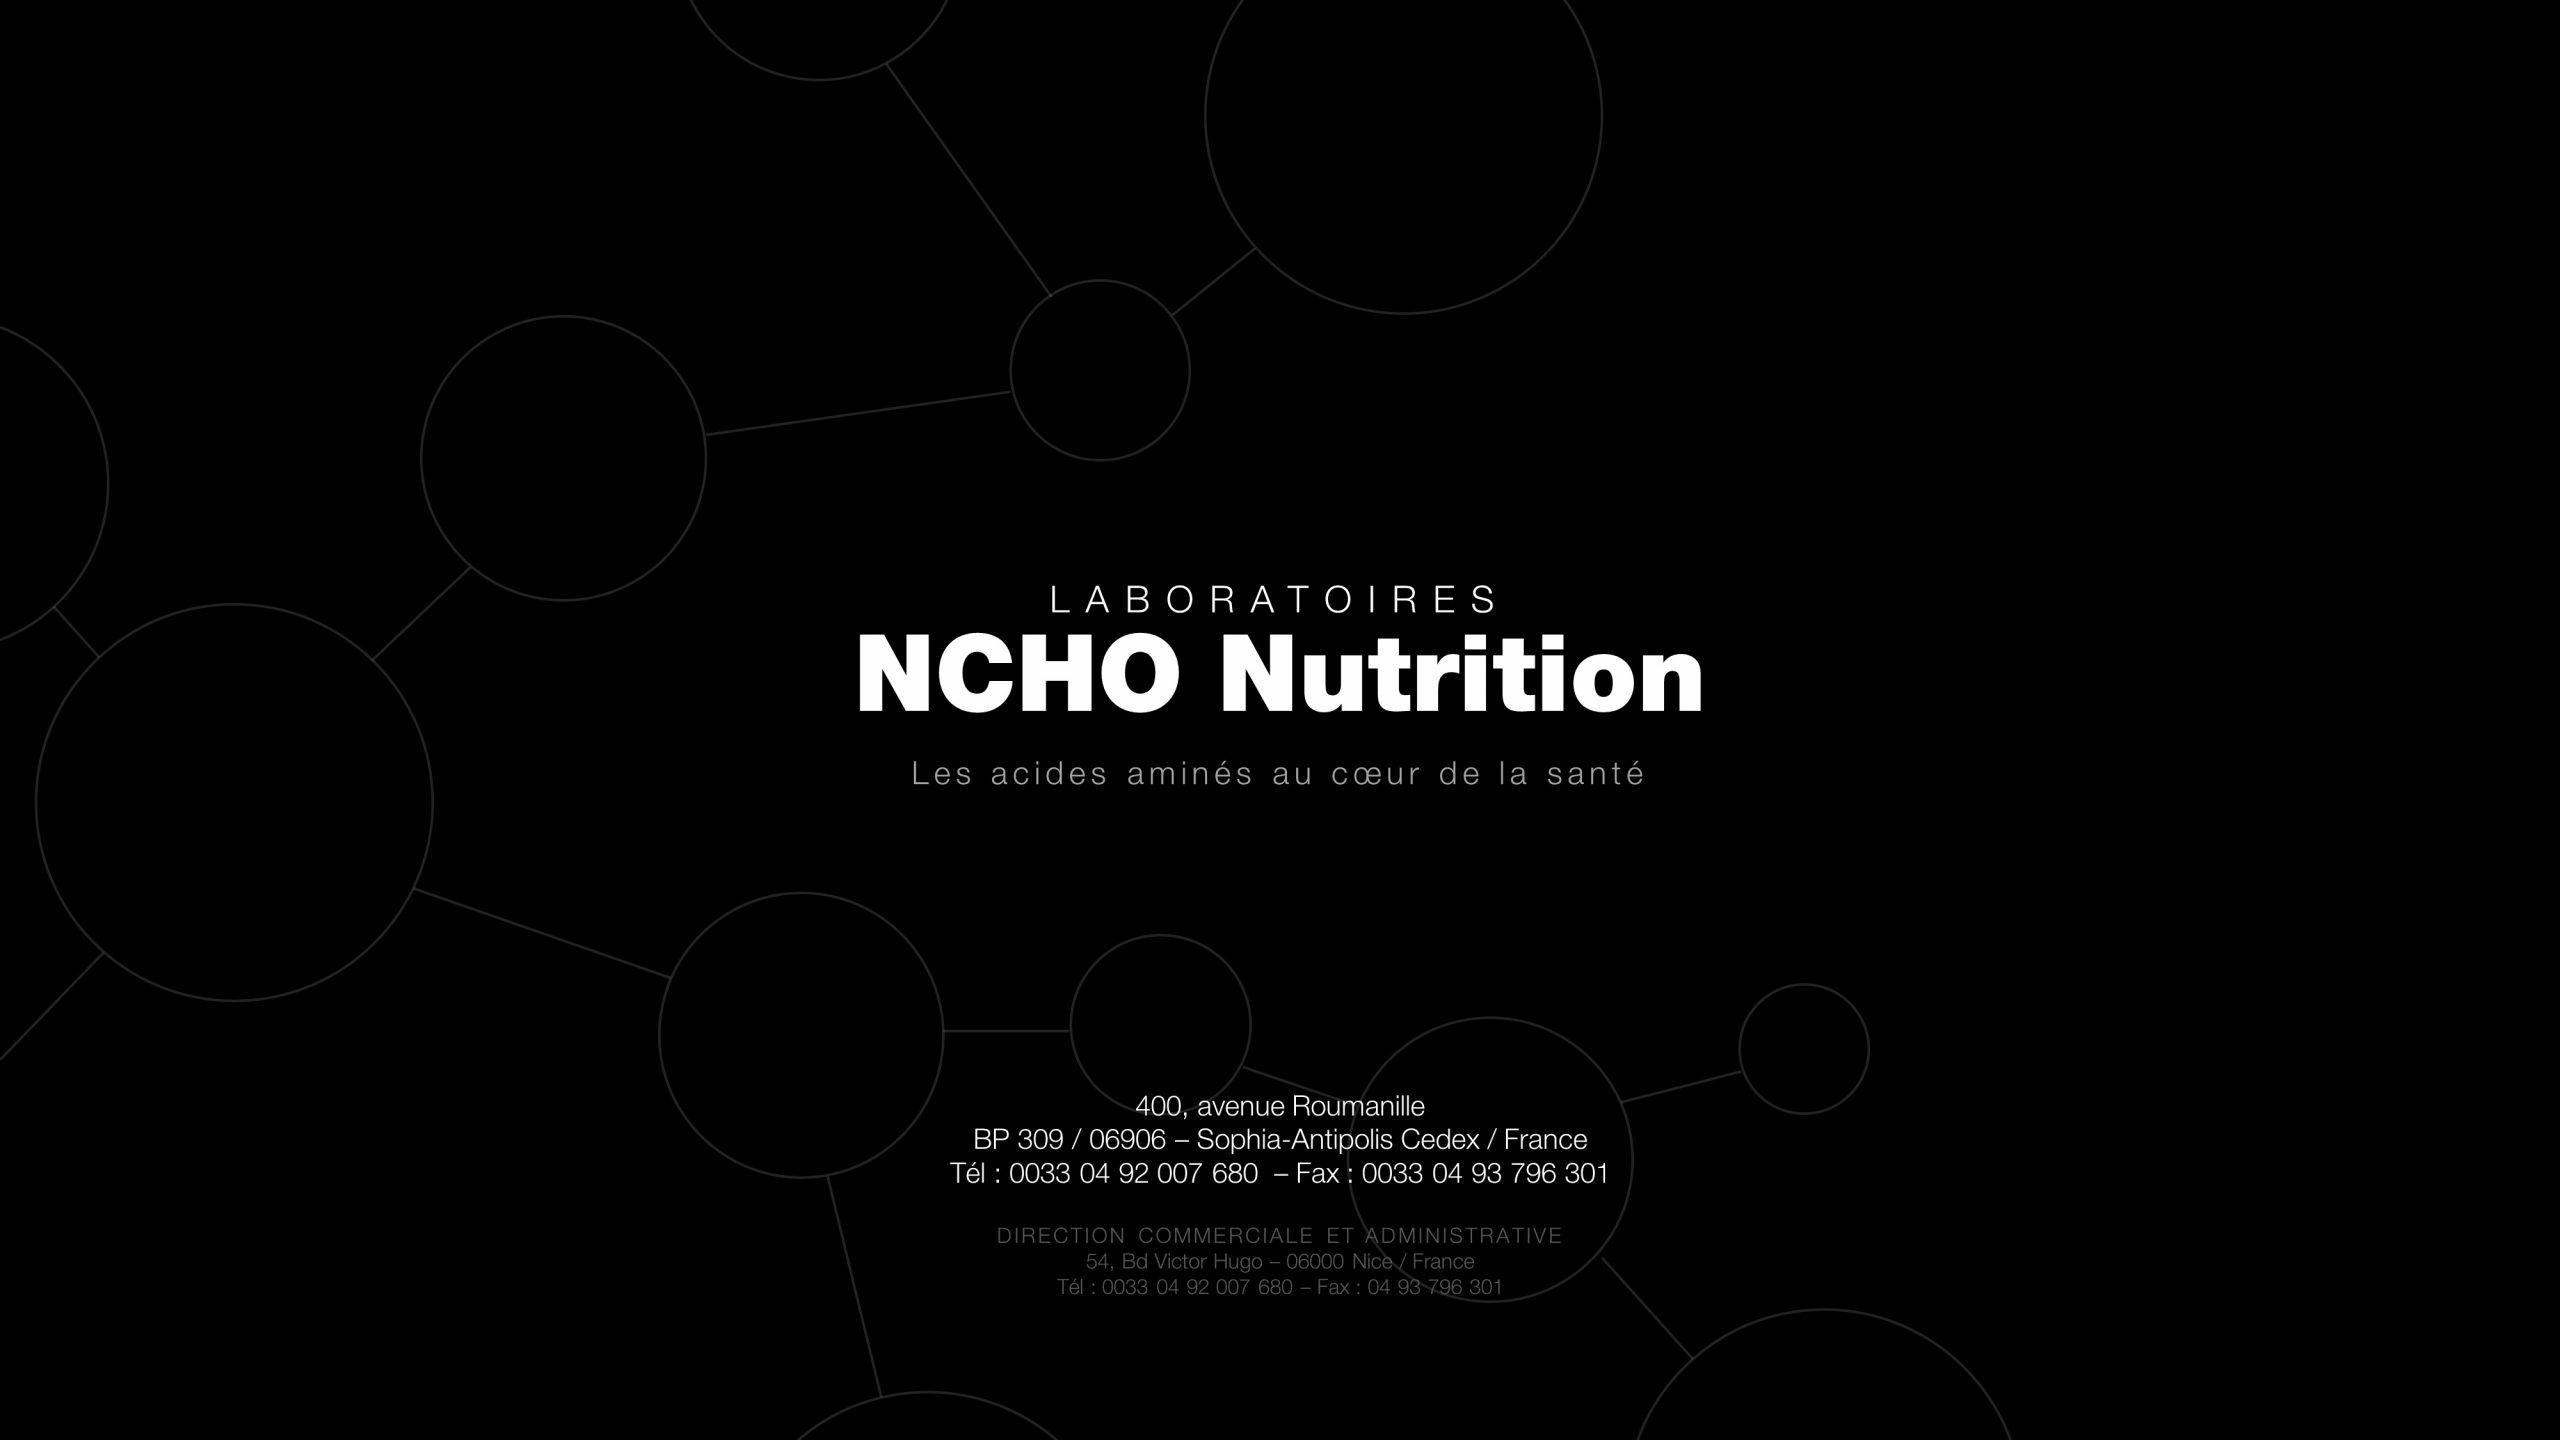 Laboratoires NHCO slideshow 3 - 83Bis design studio